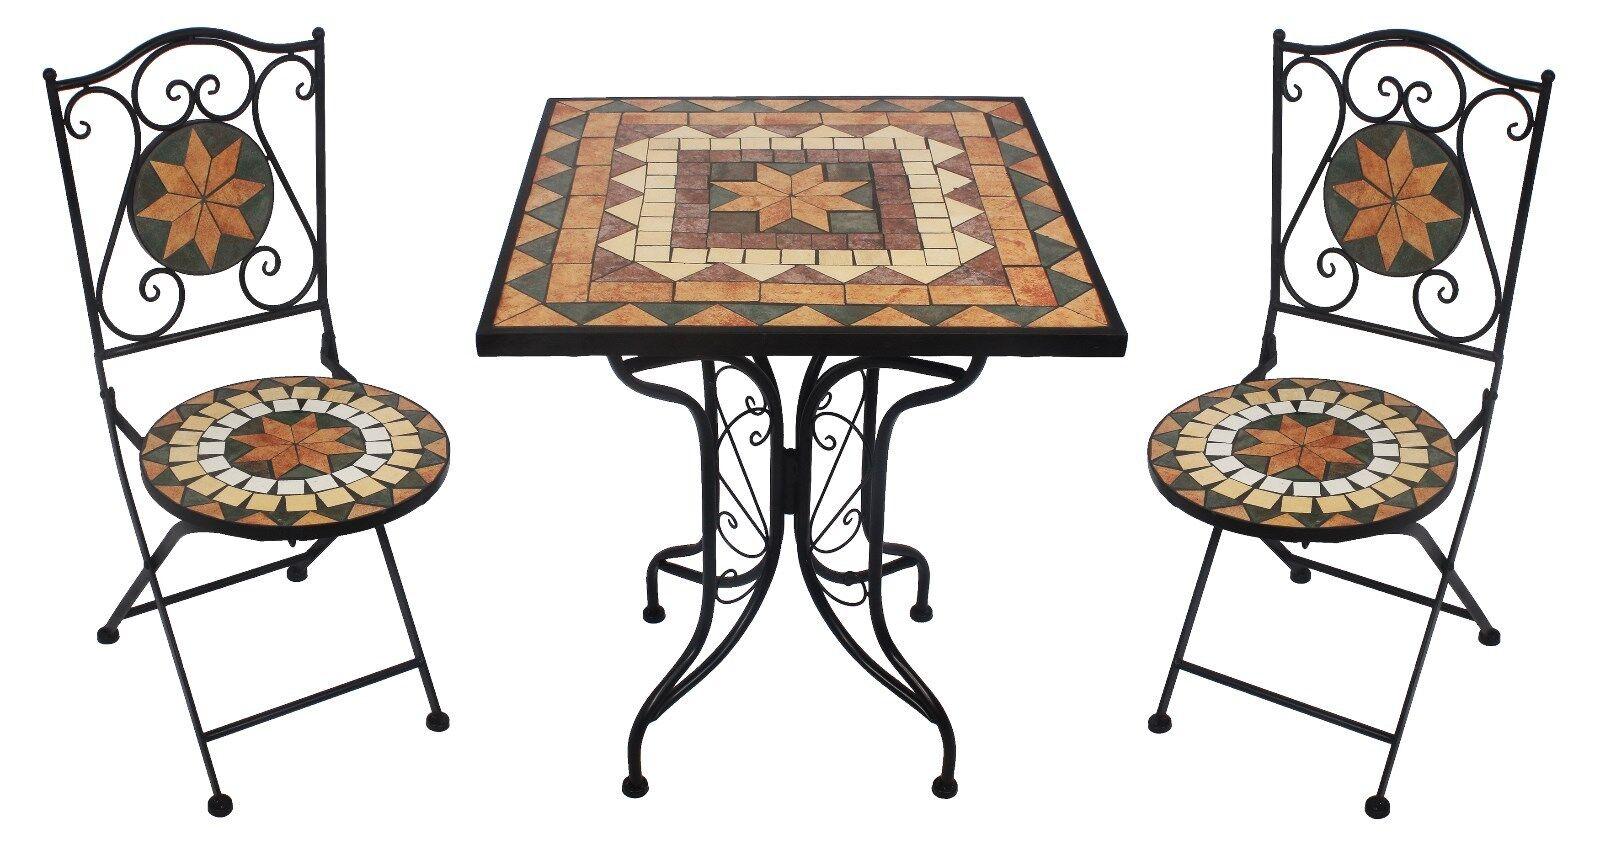 Mosaikset Rijeka AY 2659 Garten Balkon Terrasse Deko 3 tlg 1 Tisch + 2 Stühle